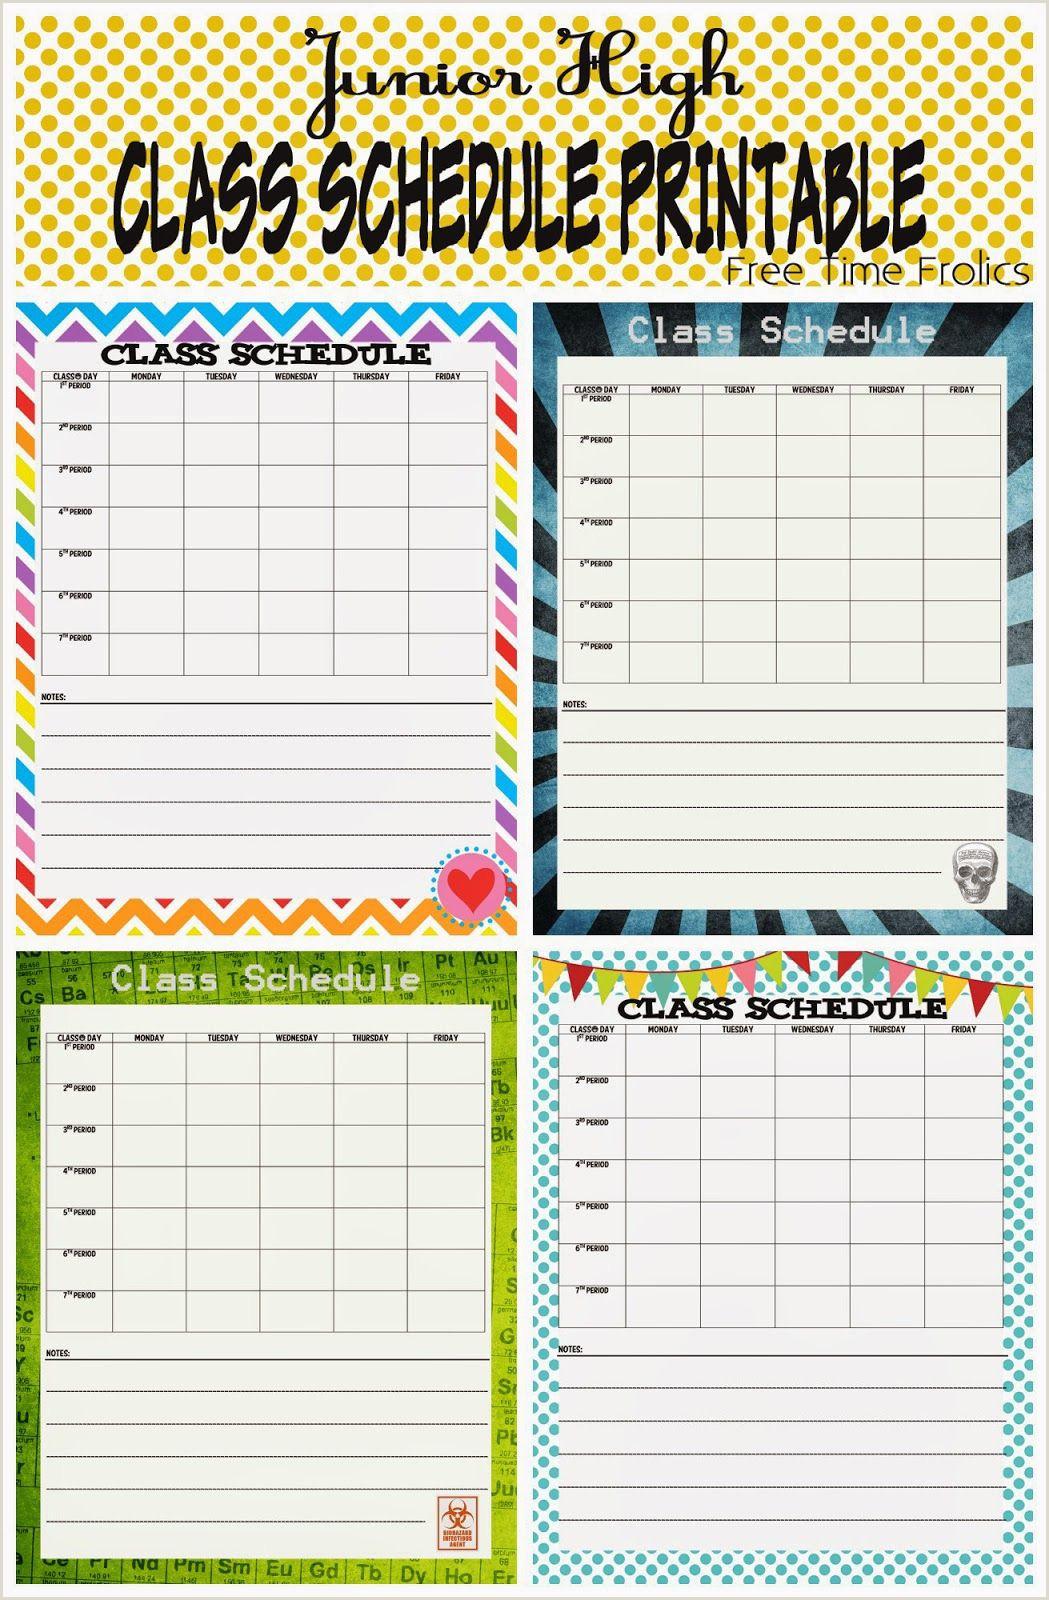 Middle School Planner Printable Junior High Class Schedule Printable